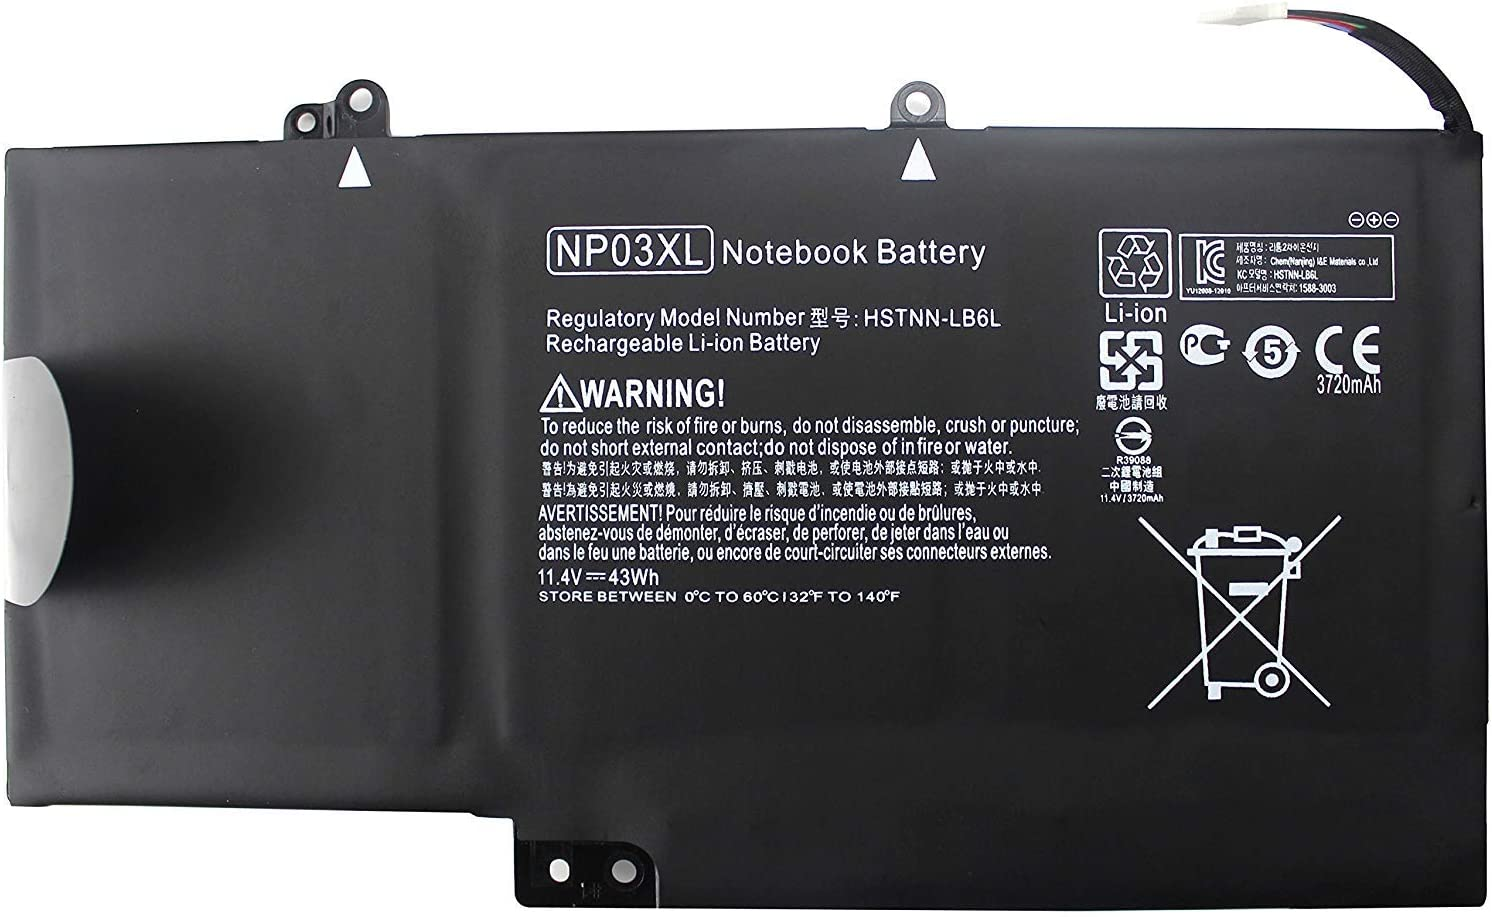 GreenTech New NP03XL 761230-005 Replacement Battery for HP Pavilion X360 13-AXXX, HP Envy X360 15T-UXXX, Envy X360 15-UXXX - GreenTech 11.4V 43Whr 3 Cell Battery NP03043XL-PR 760944-421